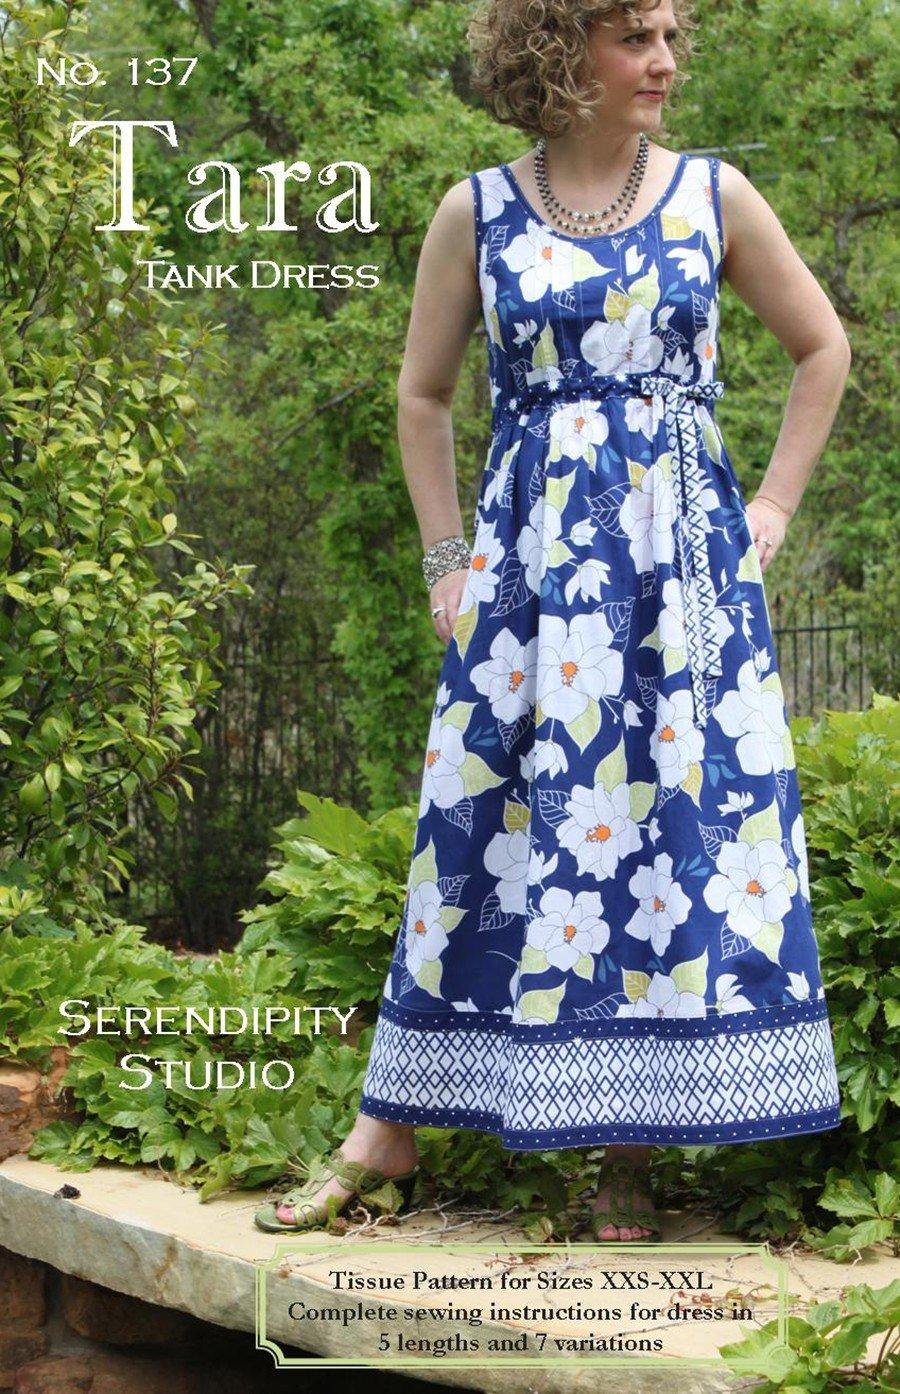 Tara Tank Dress